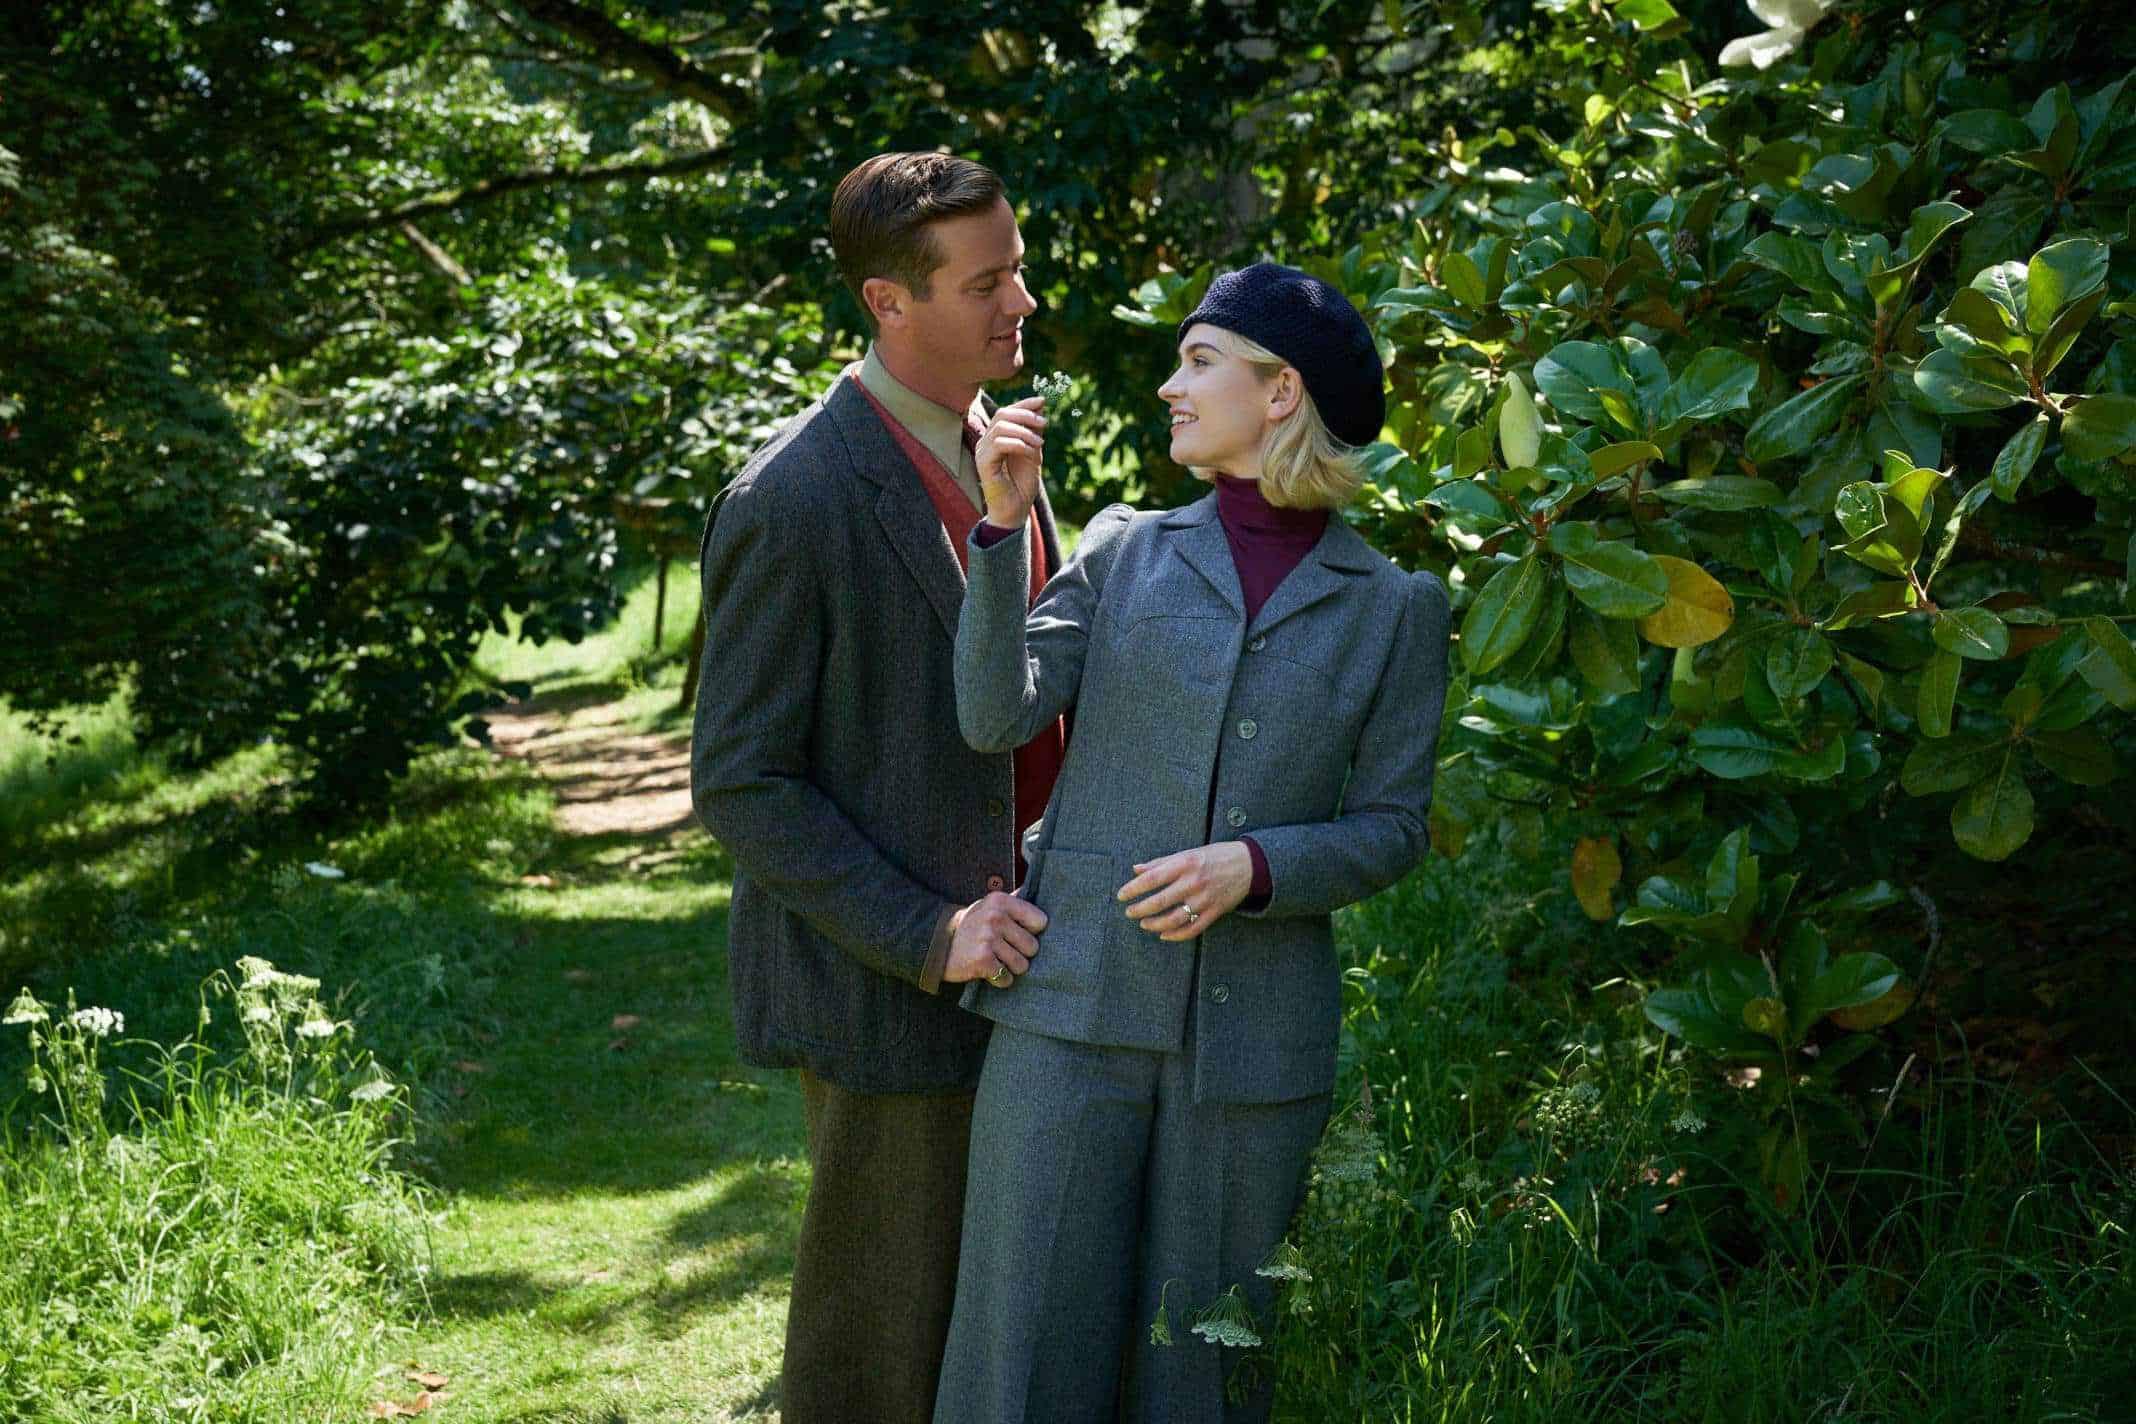 Armie Hammer as Maxim de Winter, Lily James as Mrs. de Winter.